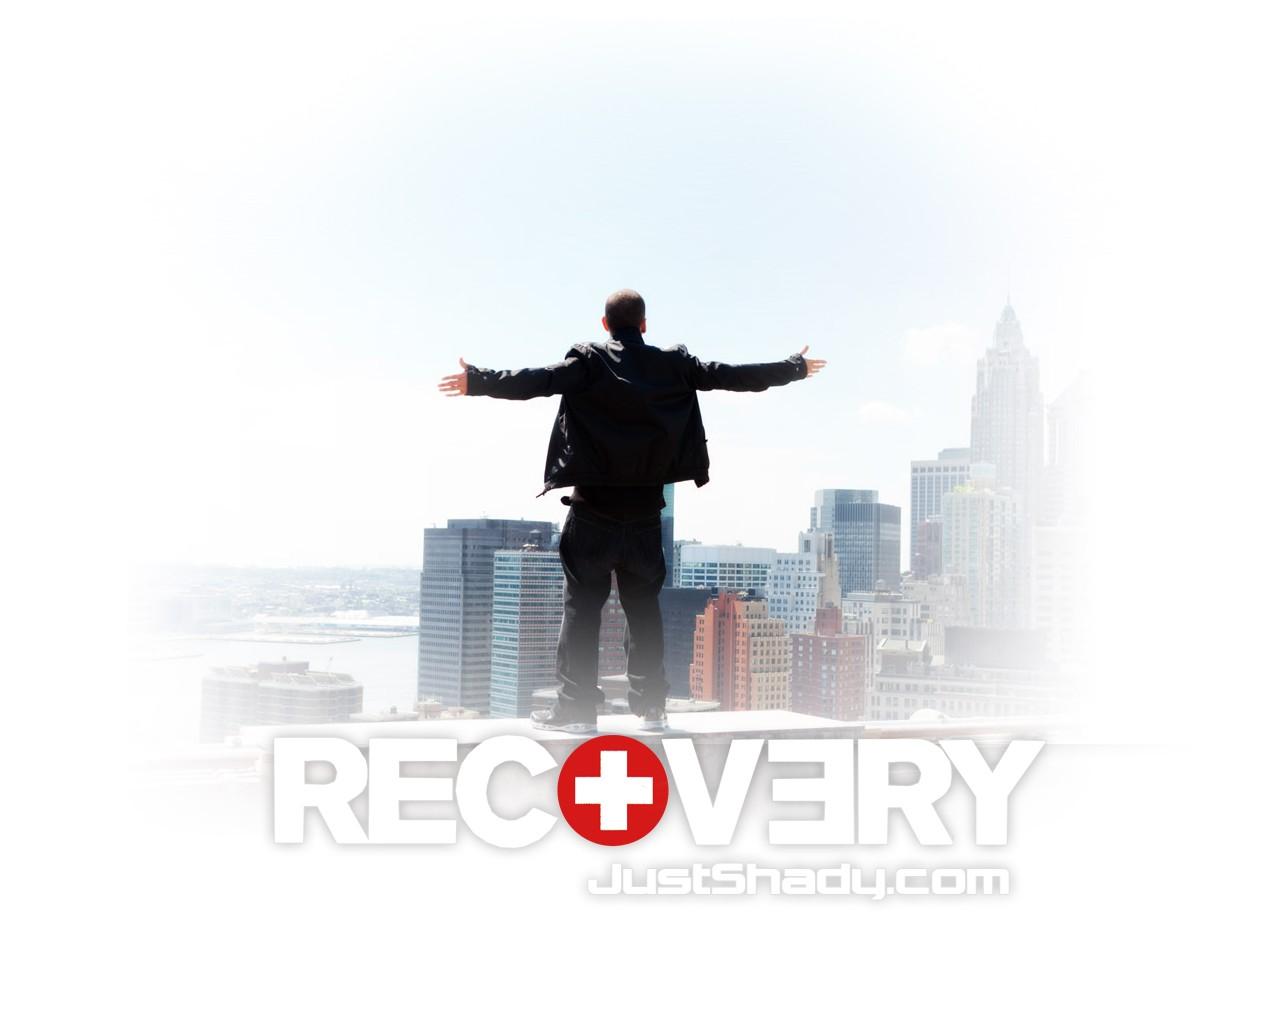 Recovery Eminem Full resolution